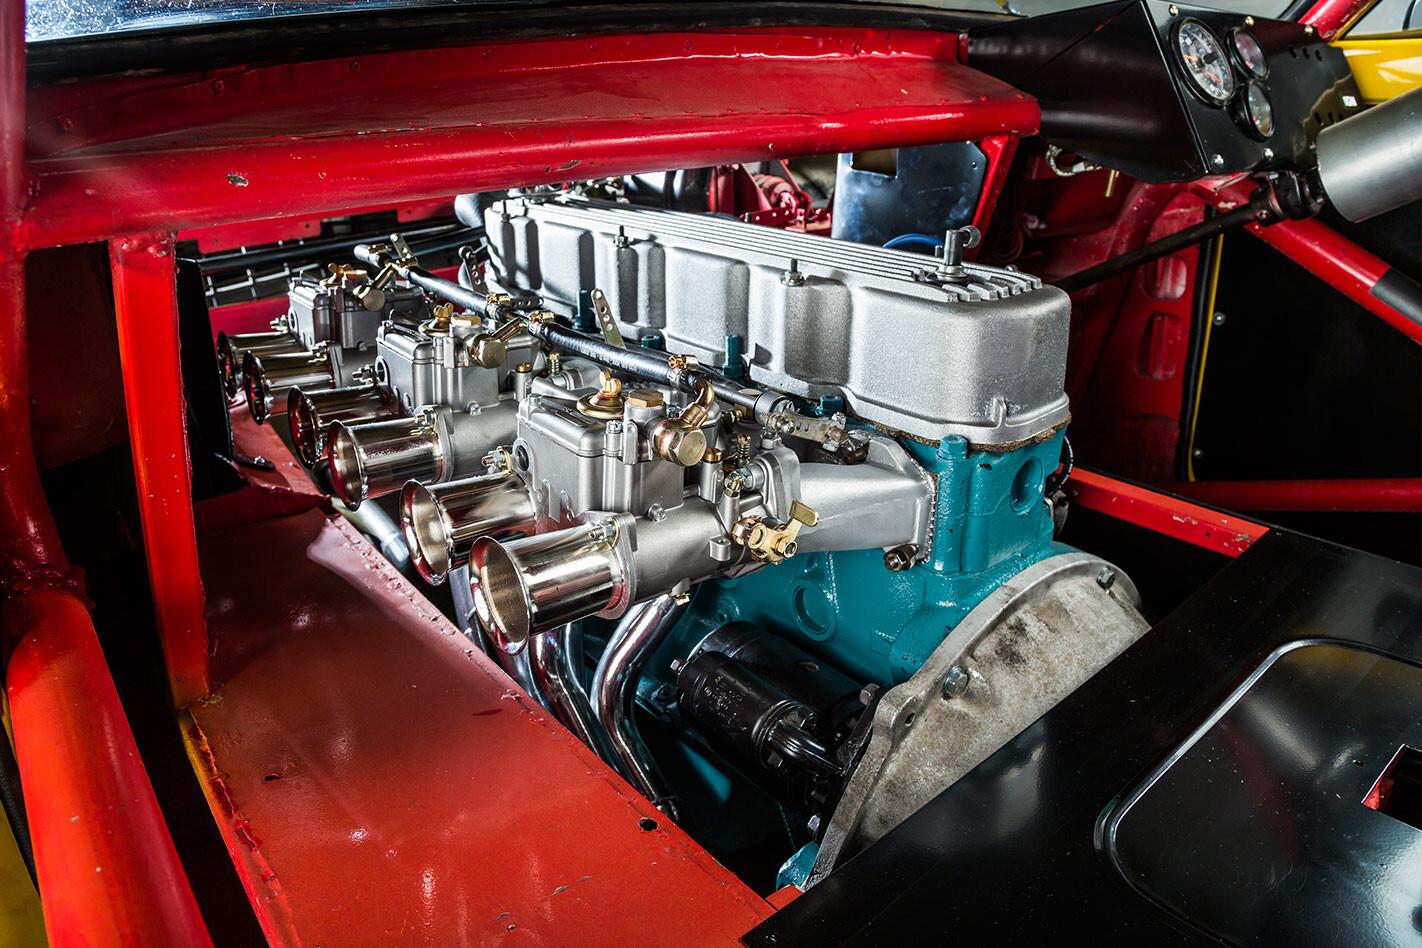 Holden LJ Torana sports sedan engine